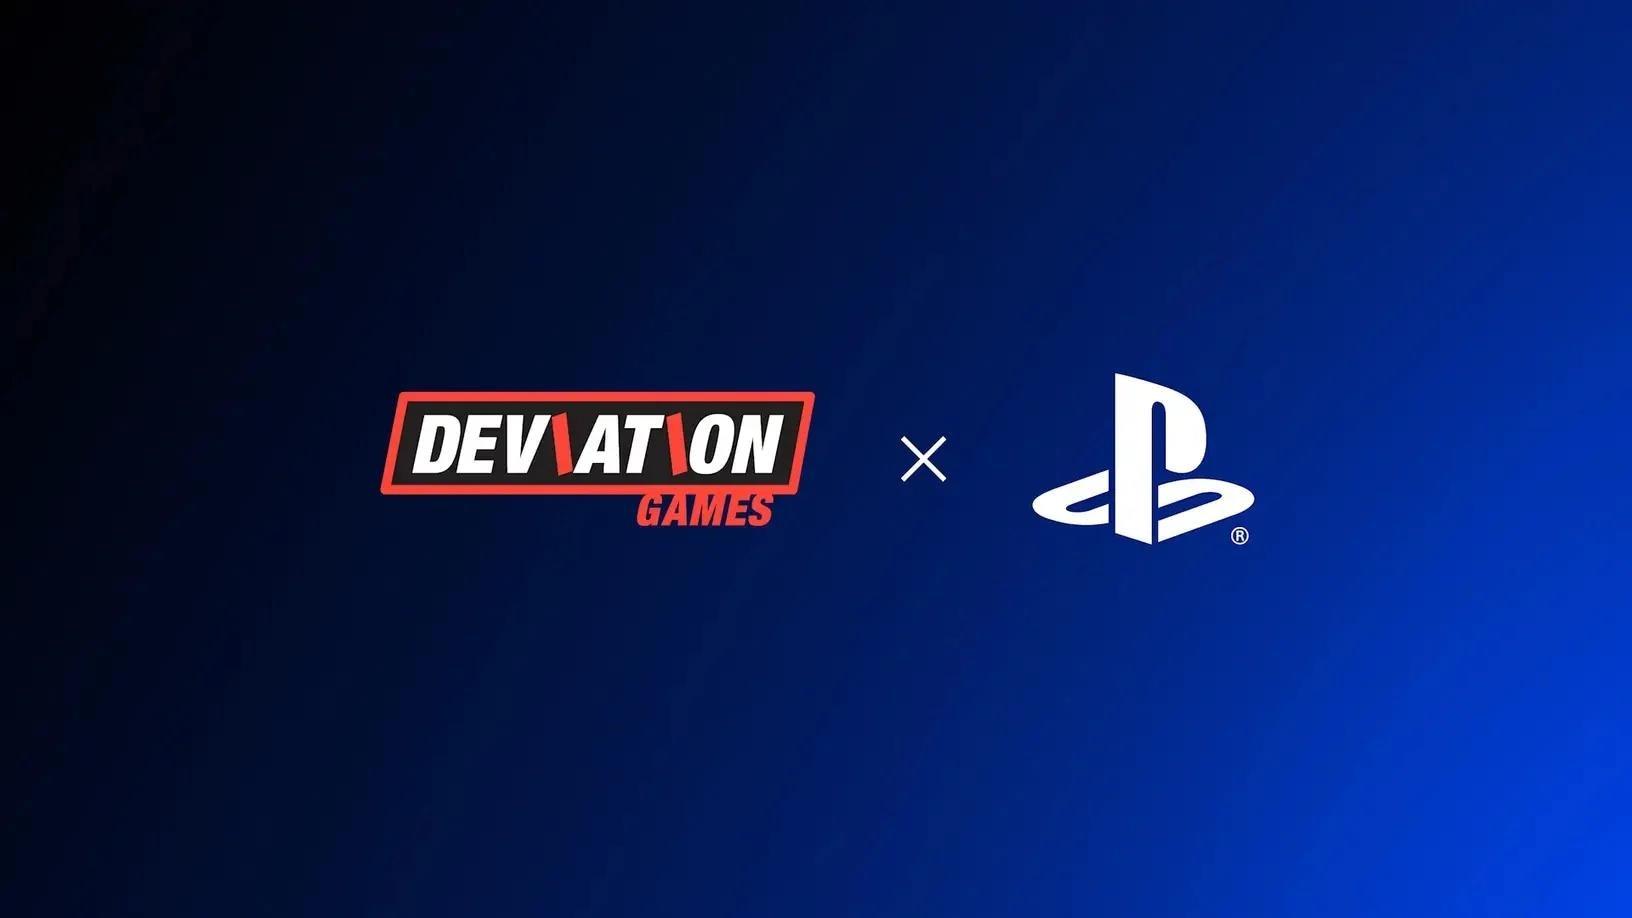 deviation PlayStation announcement